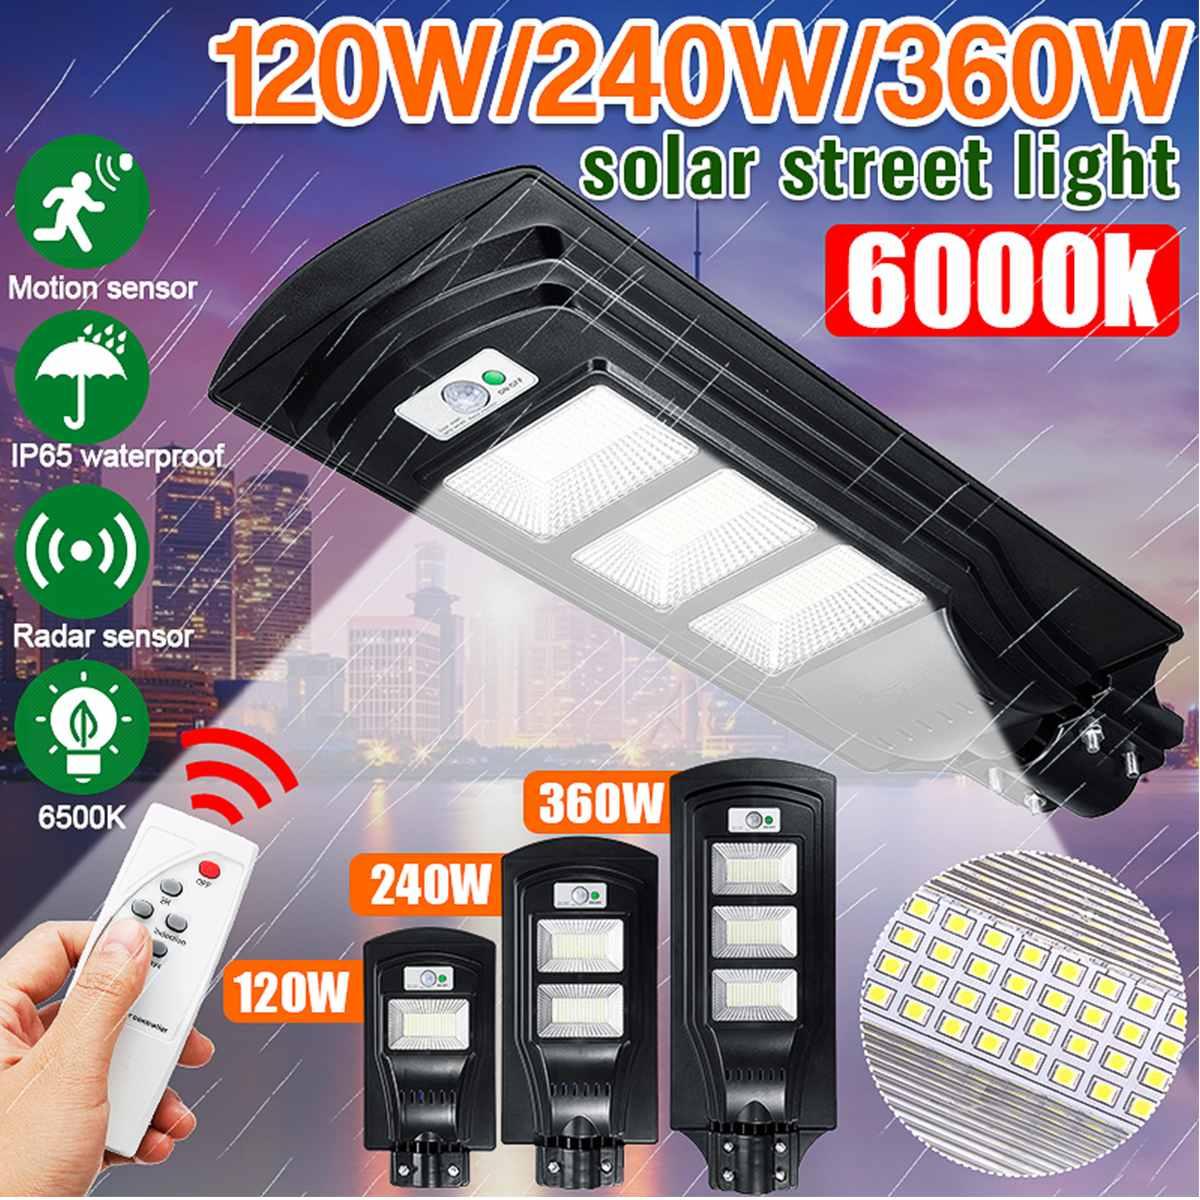 120W/240W/360W 117/234/351 LED Solar Street Light LED Light Radar PIR Motion Sensor Wall Lamp+Remote Waterproof For Plaza Garden